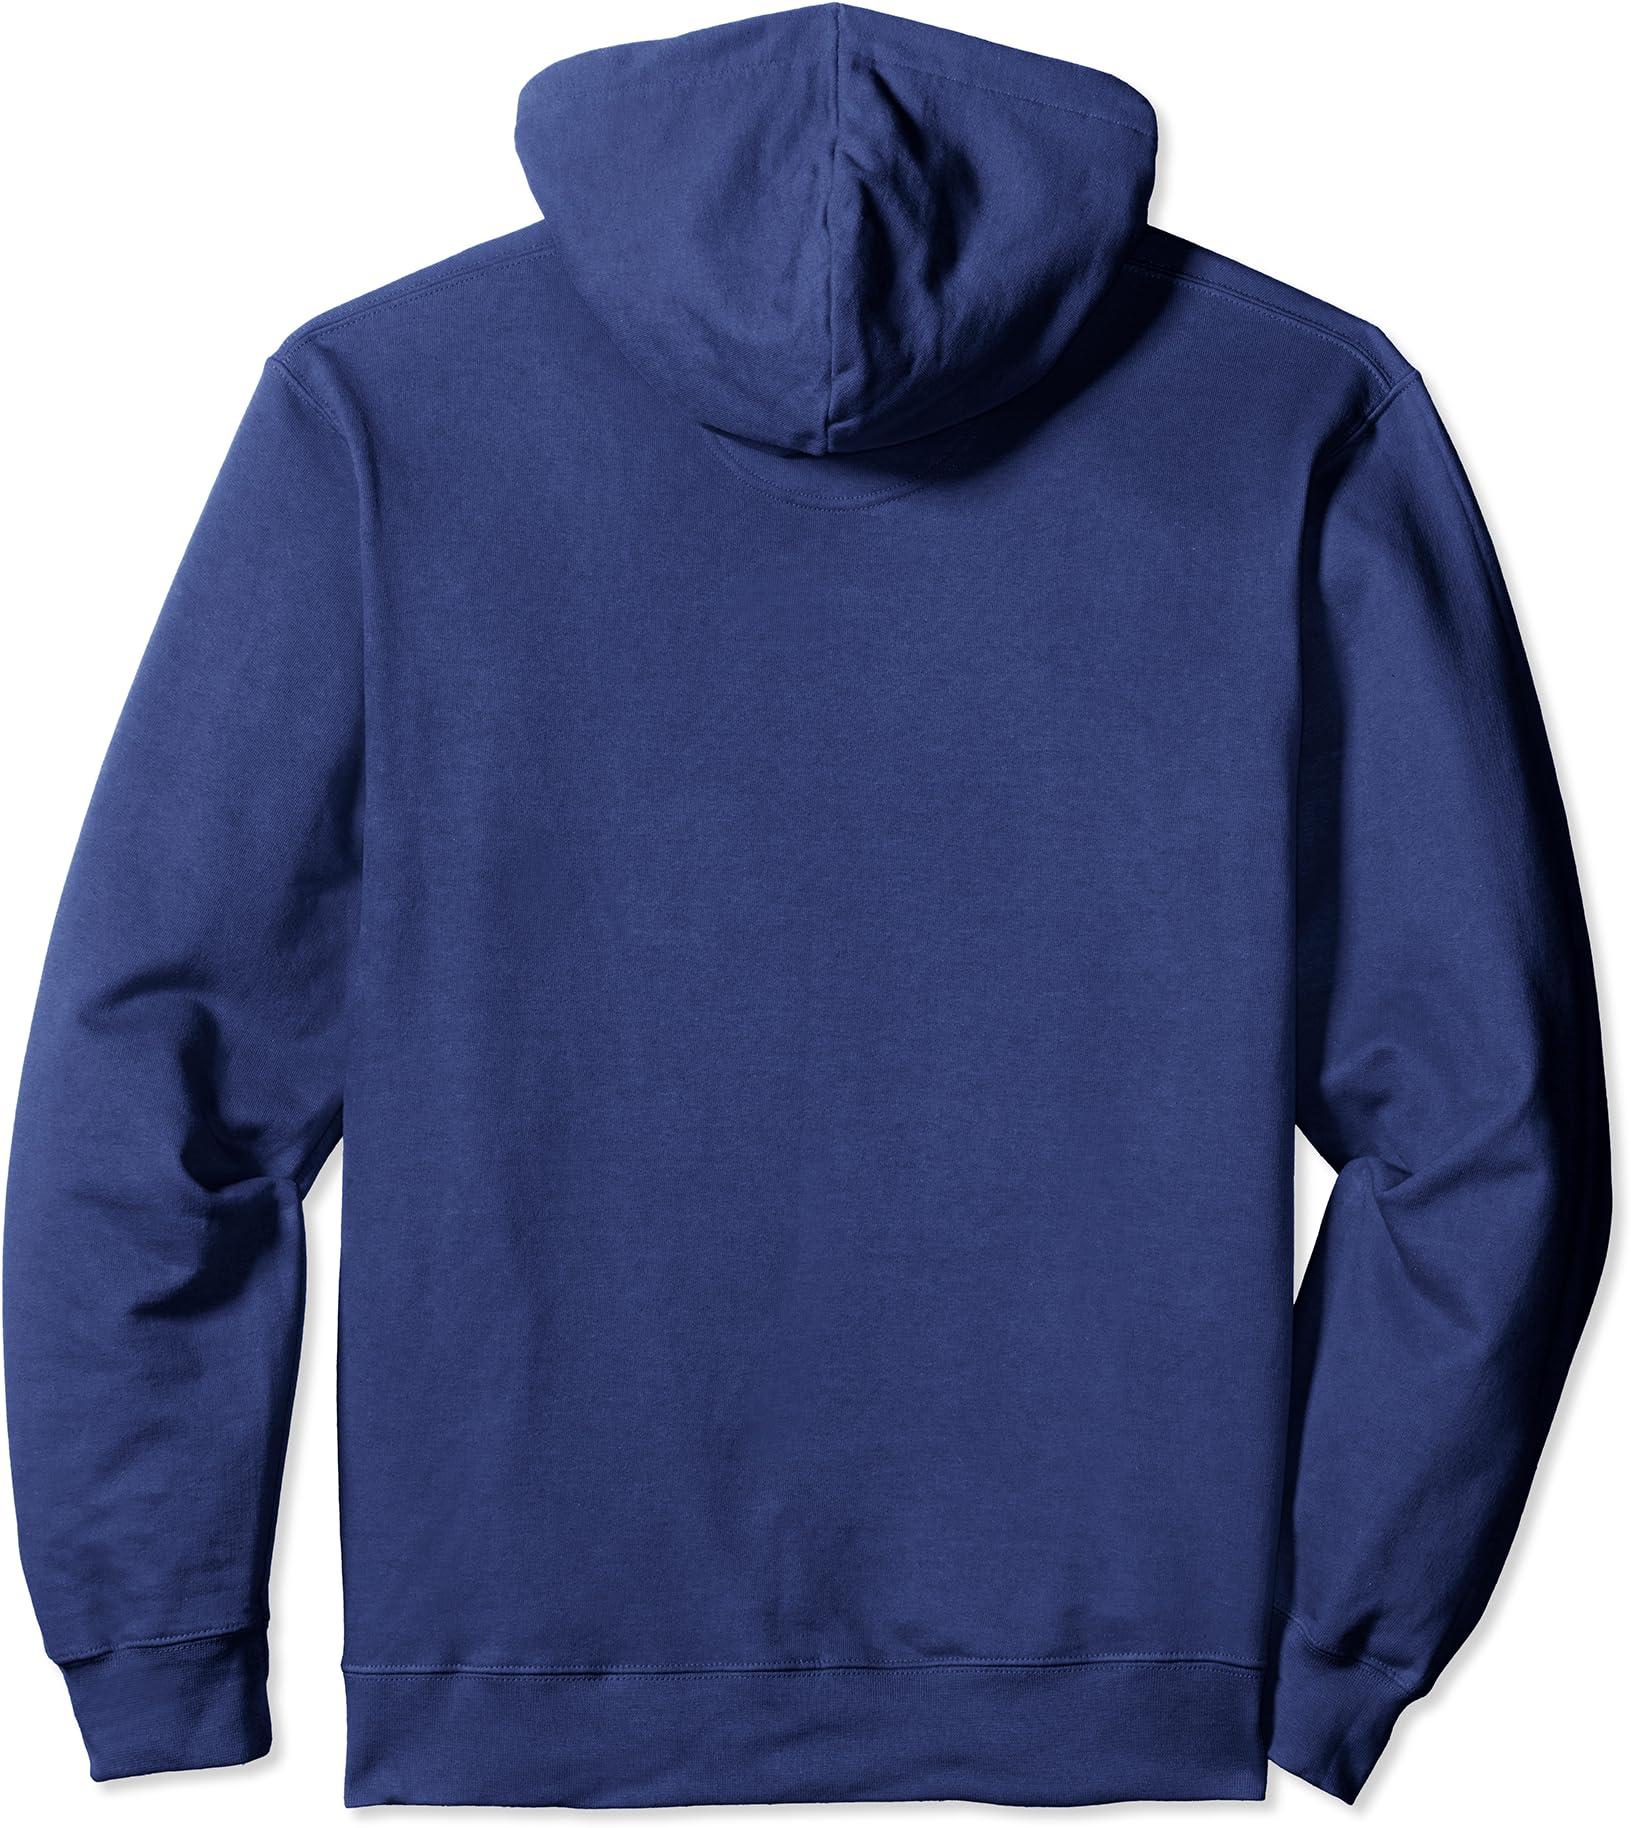 pull over hoody Black Alpinestars Always Casual wear Hoodie Men Women Unisex